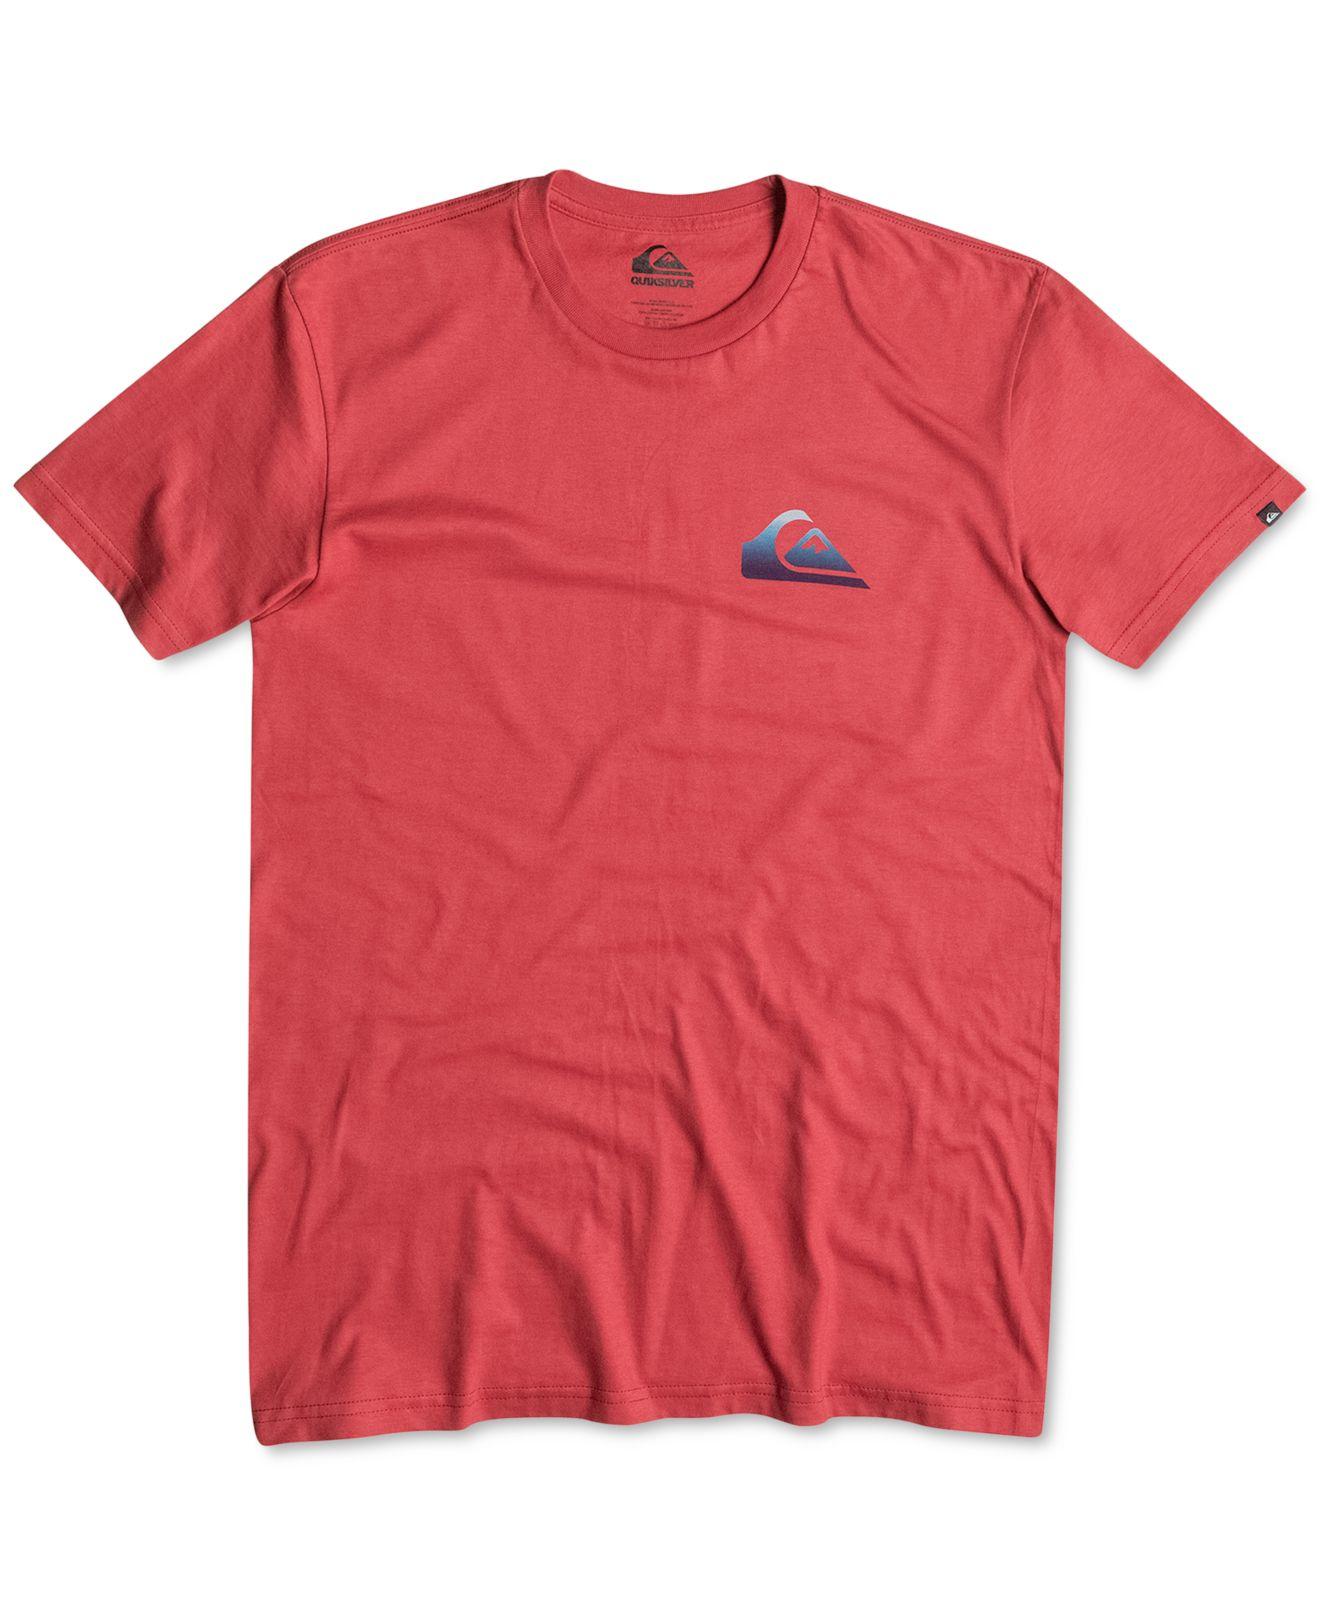 quicksilver tshirt